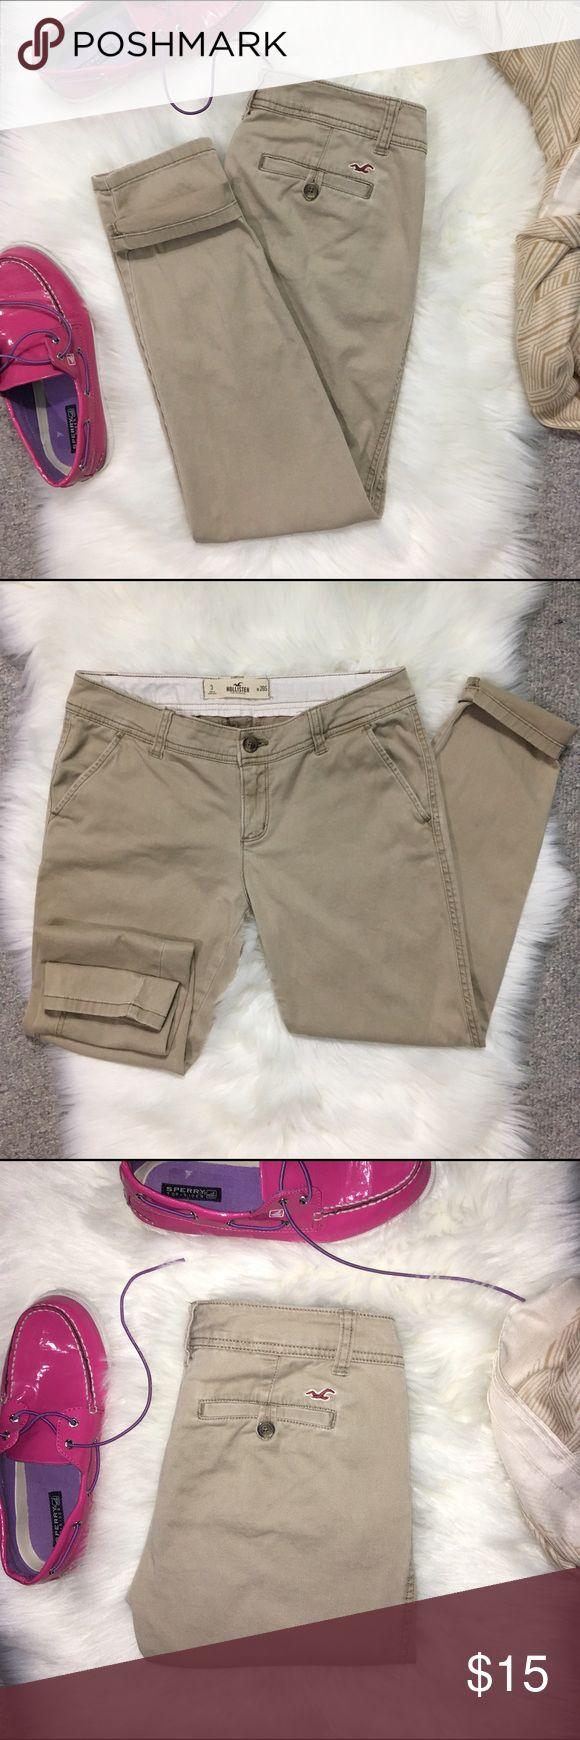 Hollister Khaki Skinny Pants Size 3/26 Short Hollister khaki skinny pants. Material is 98% cotton 2% elastane. Super soft, great for school uniforms! Size is 3/26 short. Hollister Pants Skinny